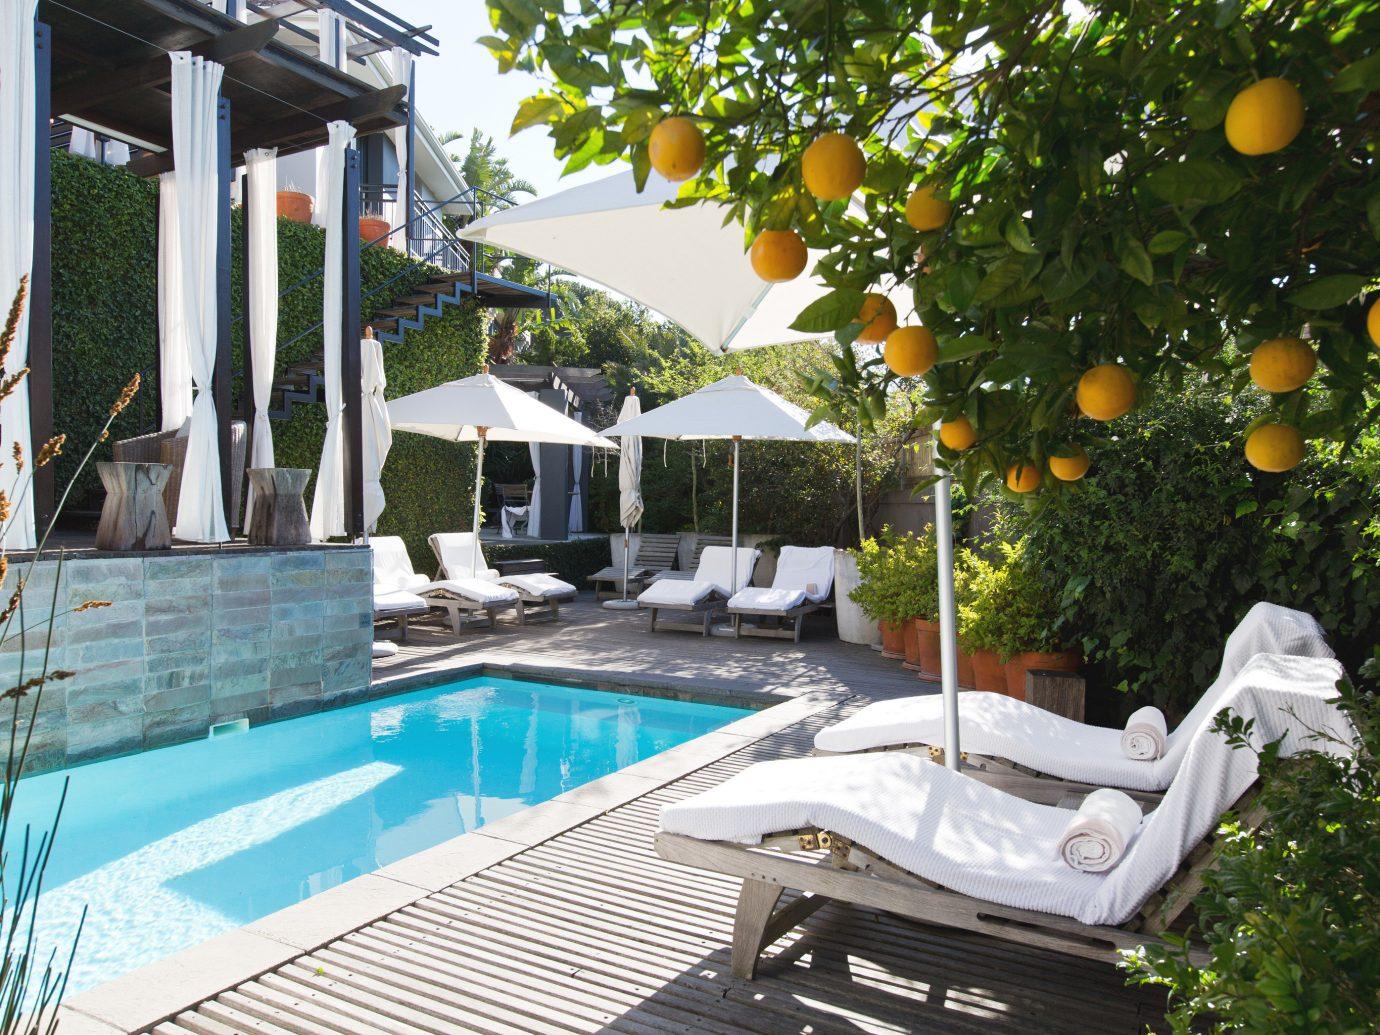 Hotels tree swimming pool property leisure Villa estate backyard Resort condominium home cottage real estate mansion furniture